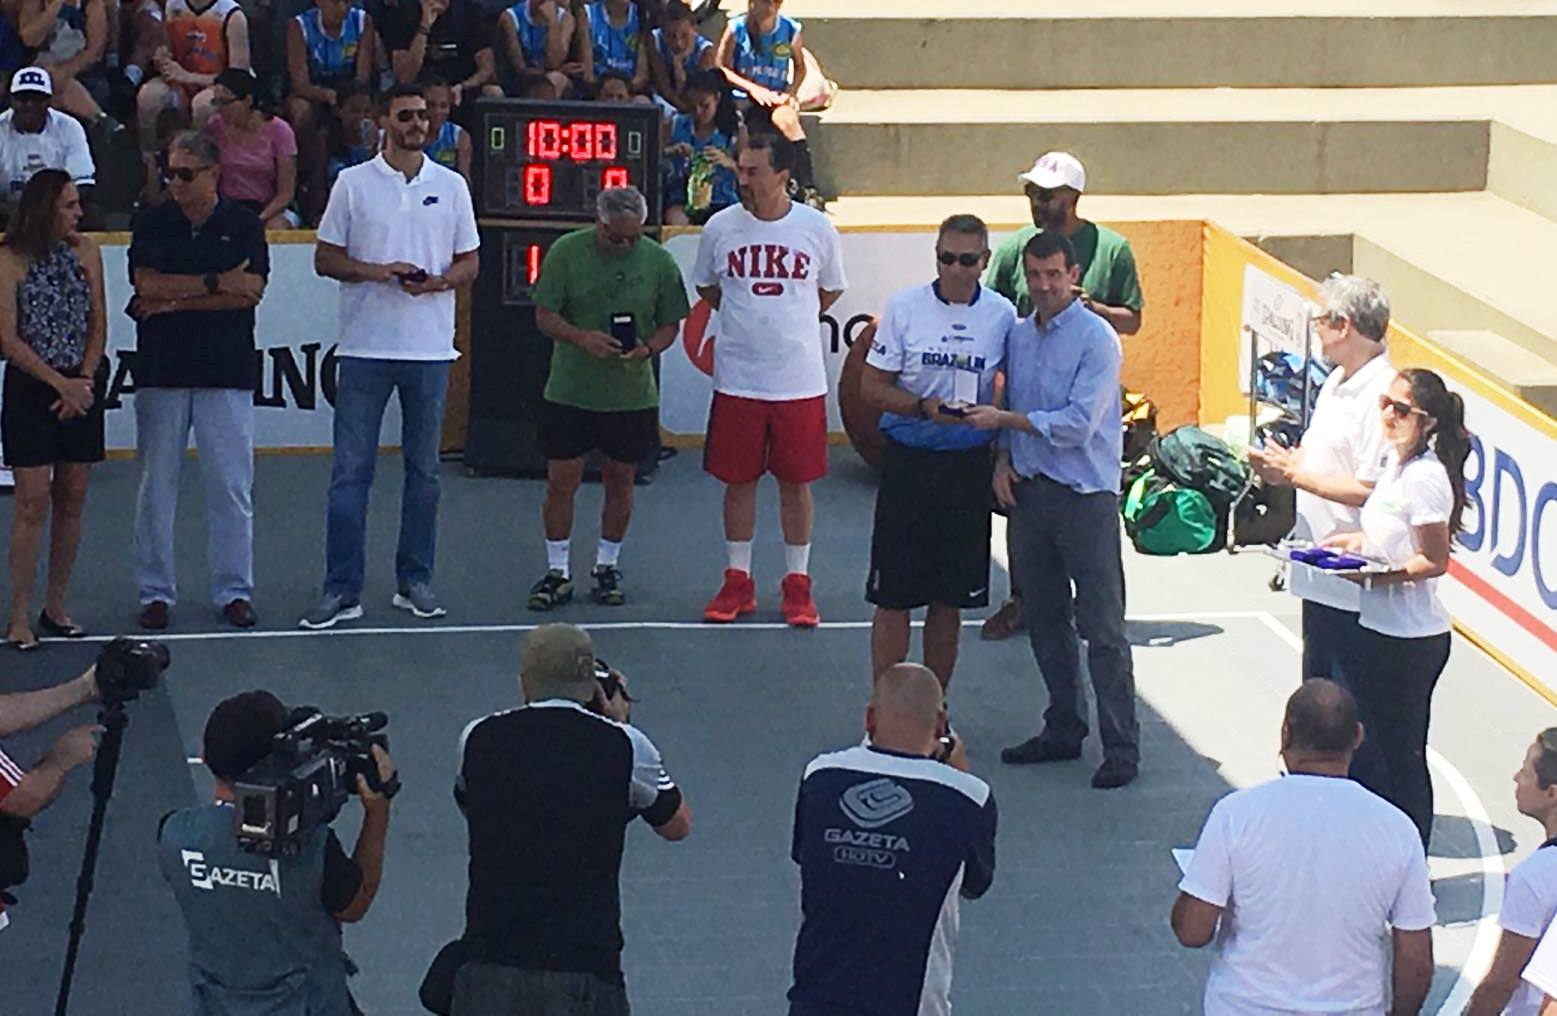 Malfi recebendo a medalha / Foto: Kiko Ross/ASE